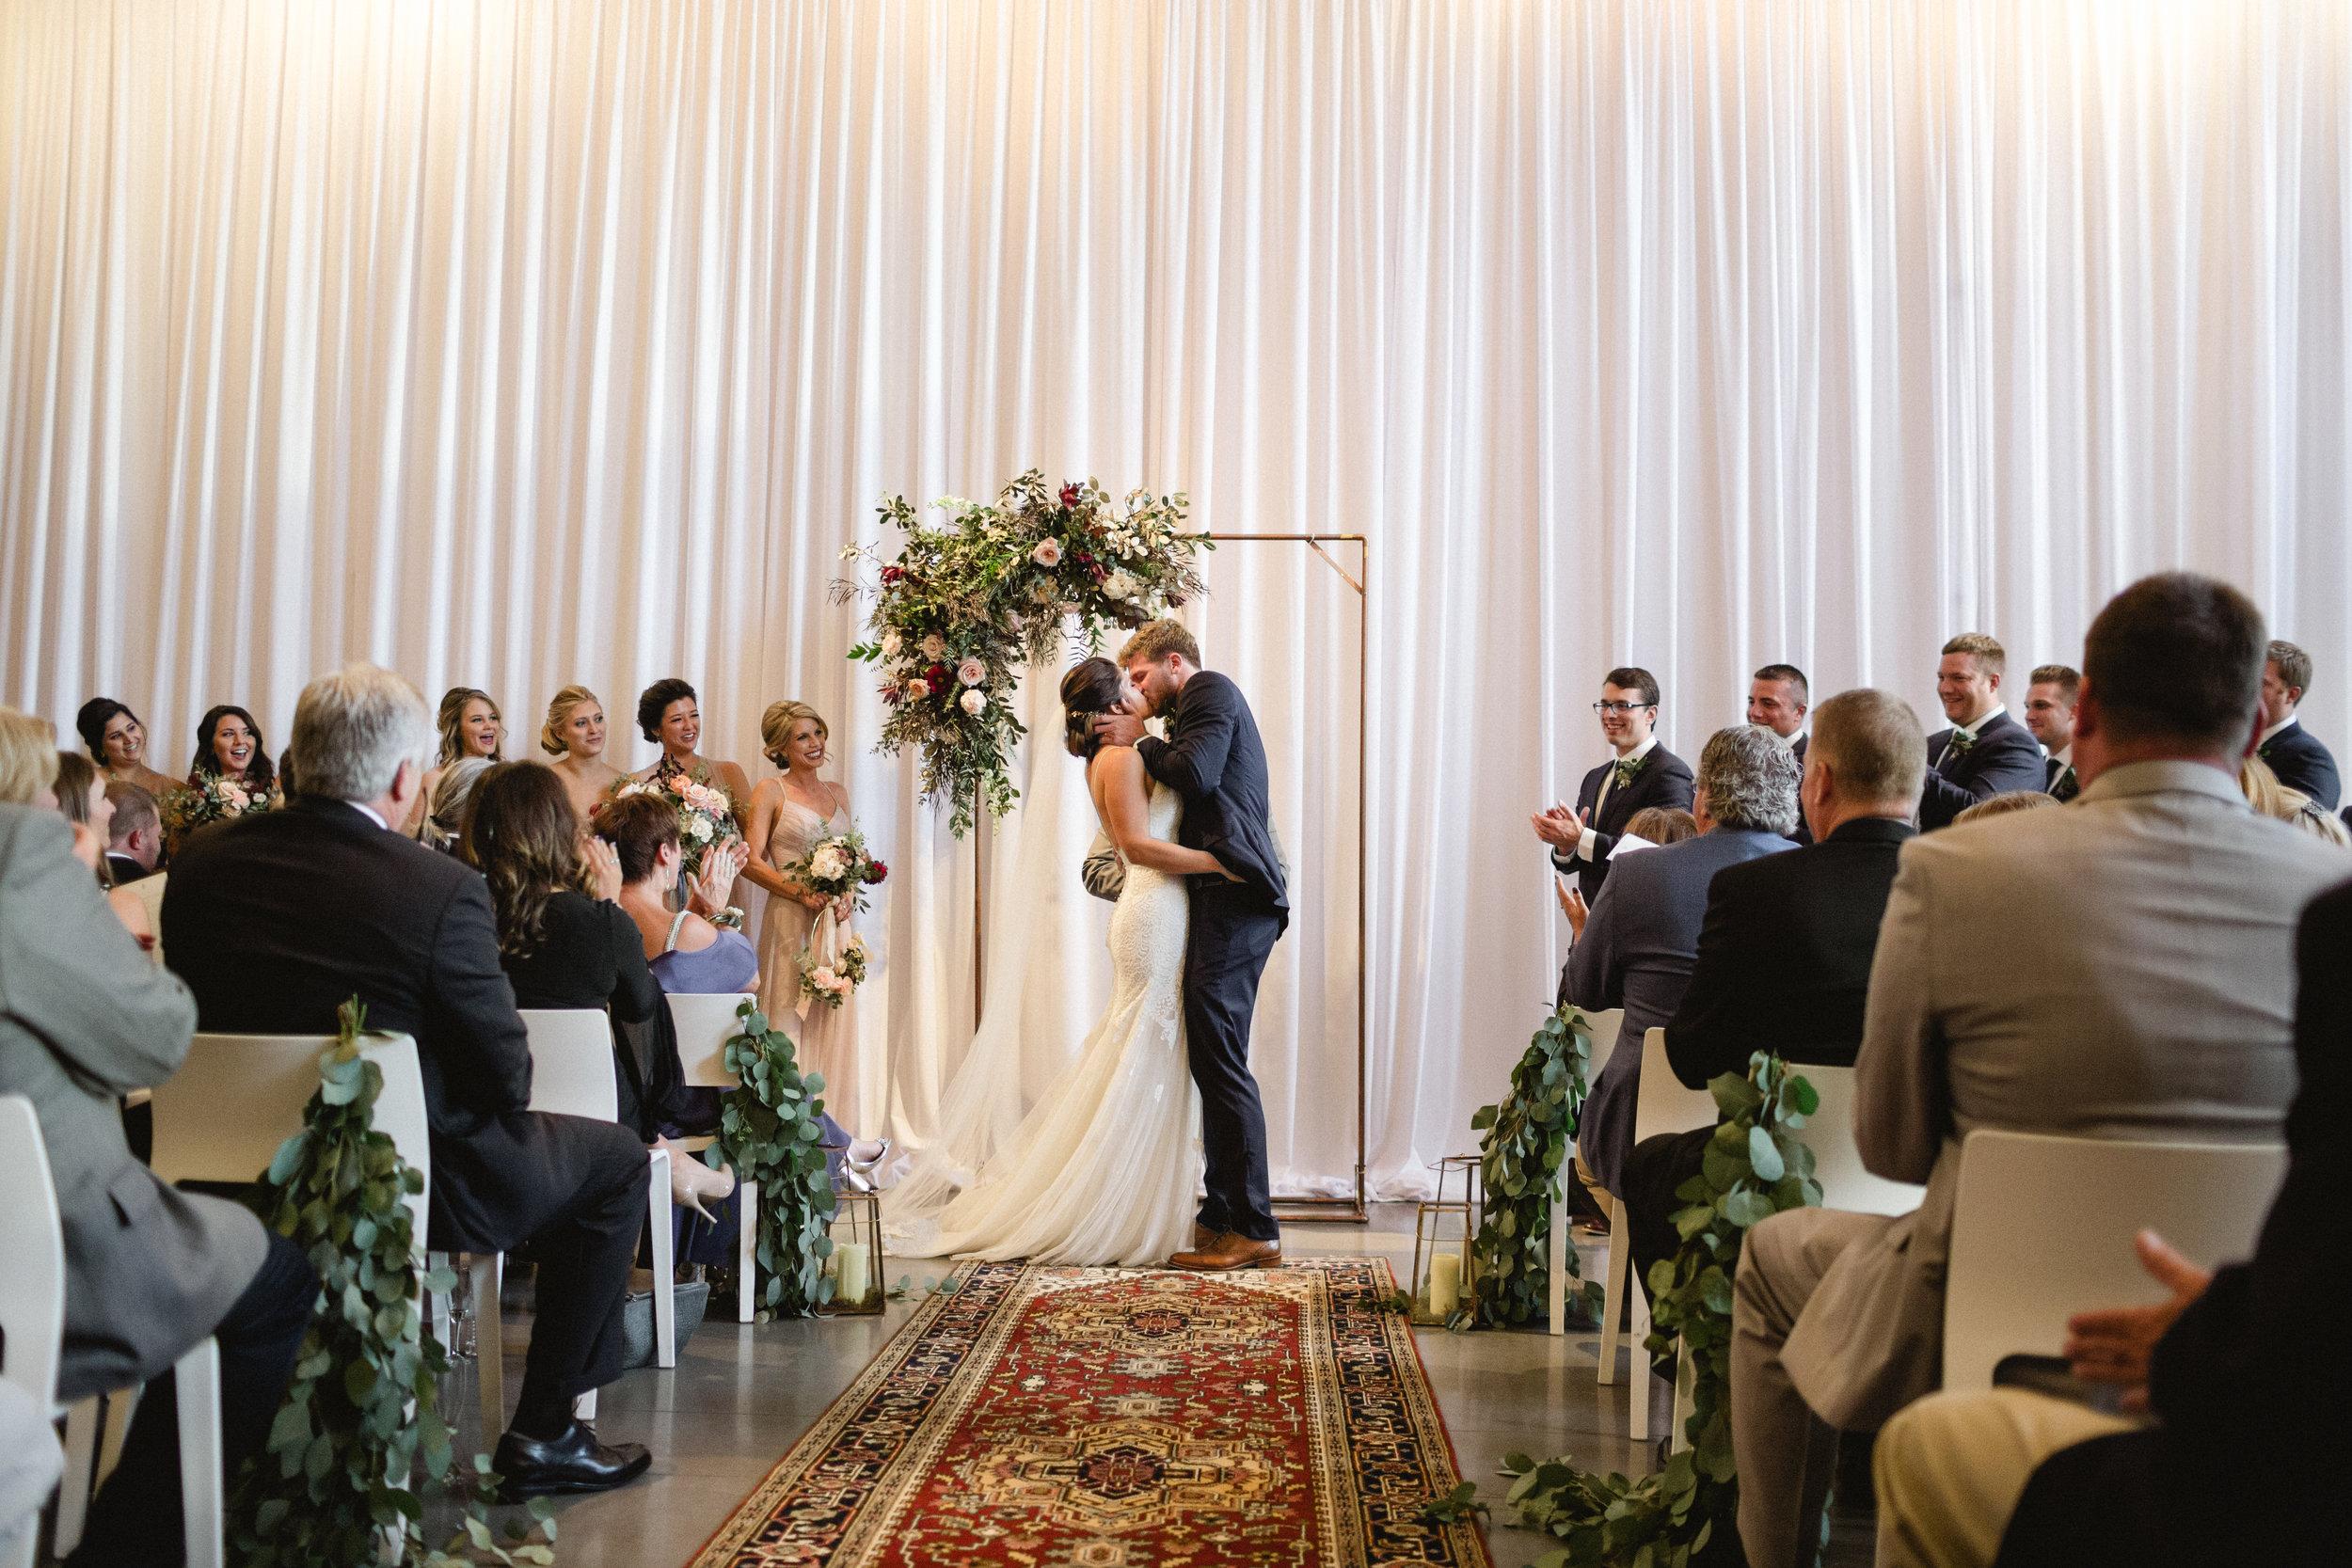 0736_ElizabethRyan_Wedding_AmyCampbellPhotography.jpg